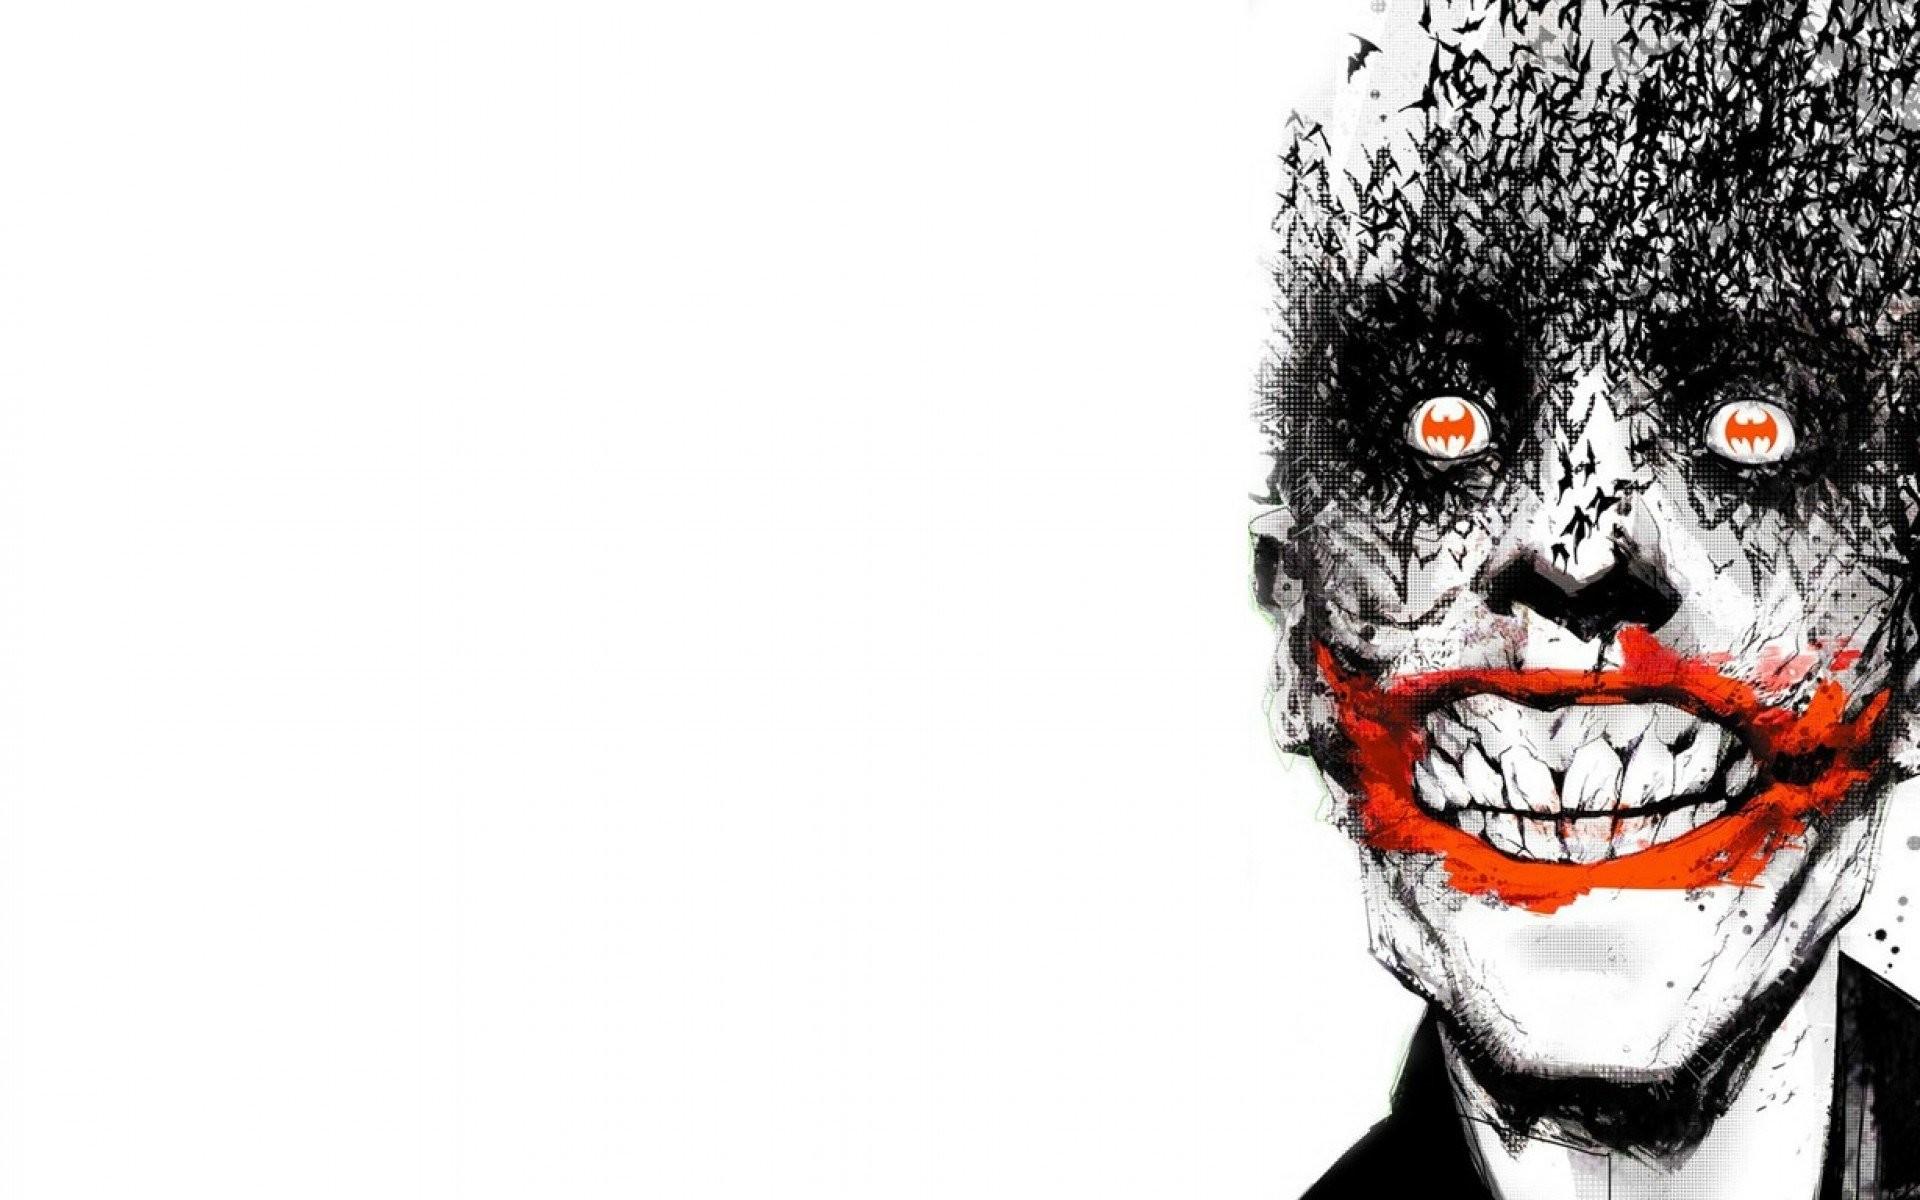 Batman And The Joker Wallpapers HD Desktop Background